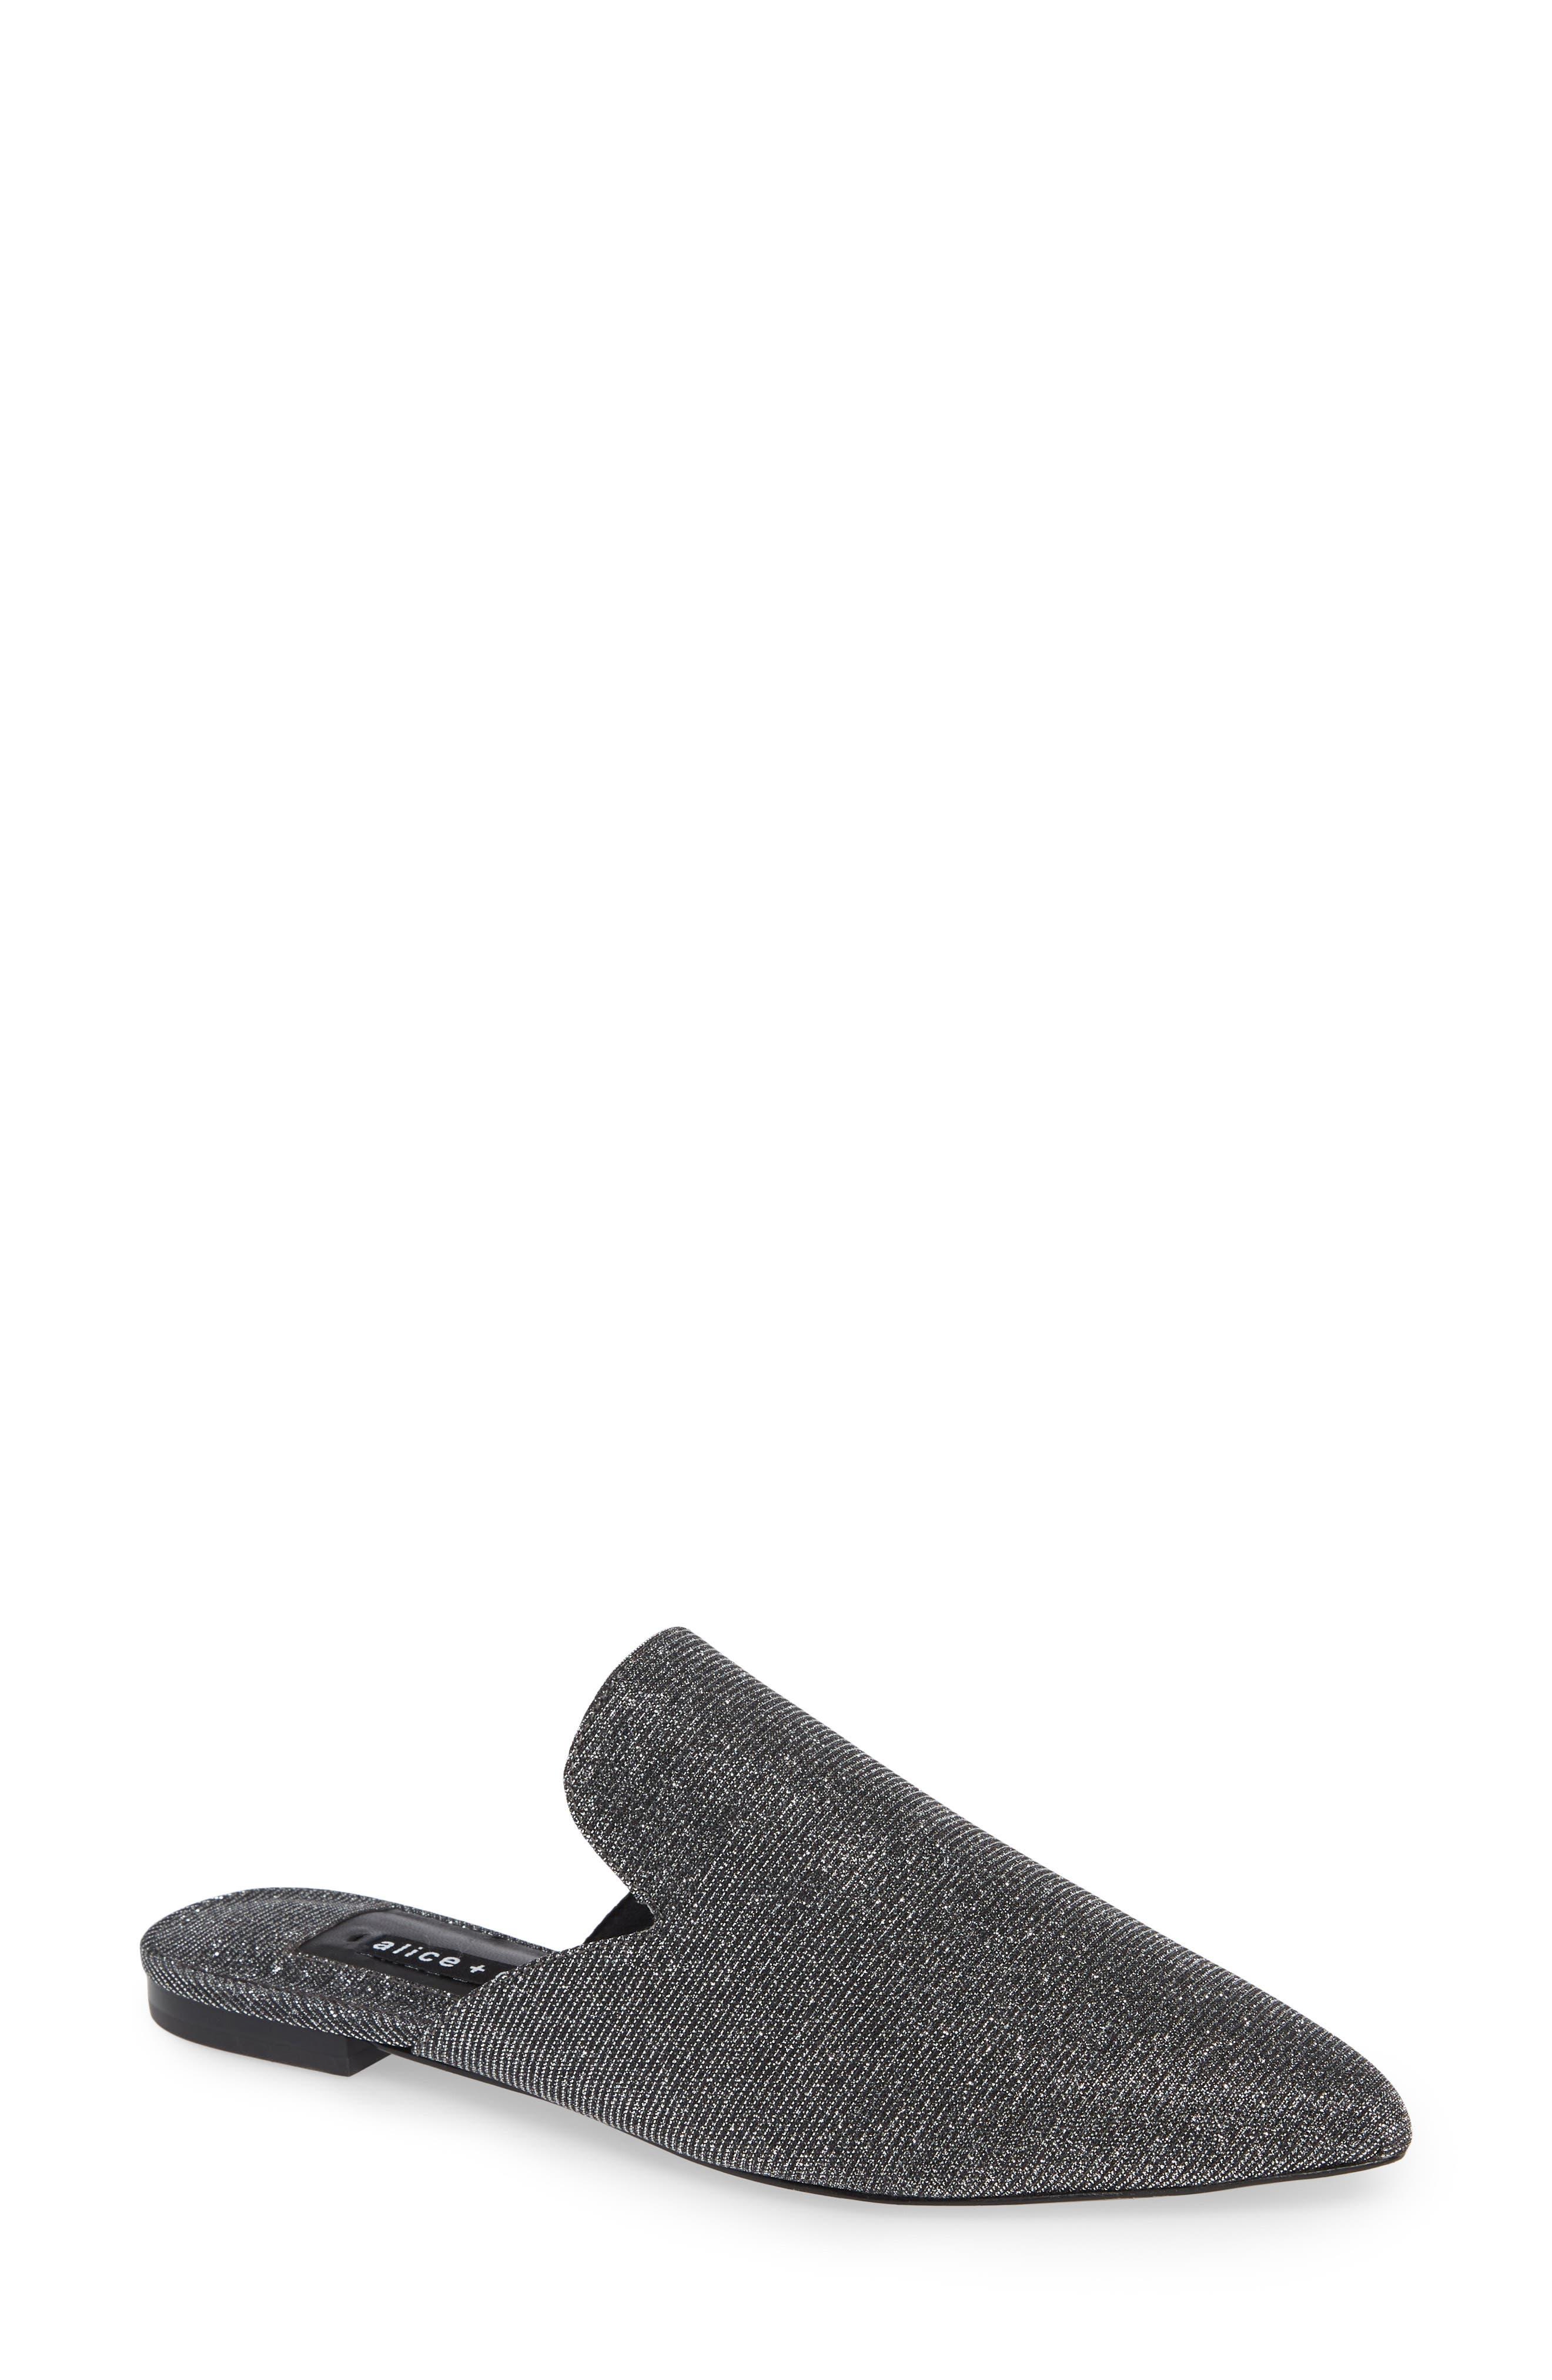 Madalyn Glitter Mules in Black/Silver Fabric